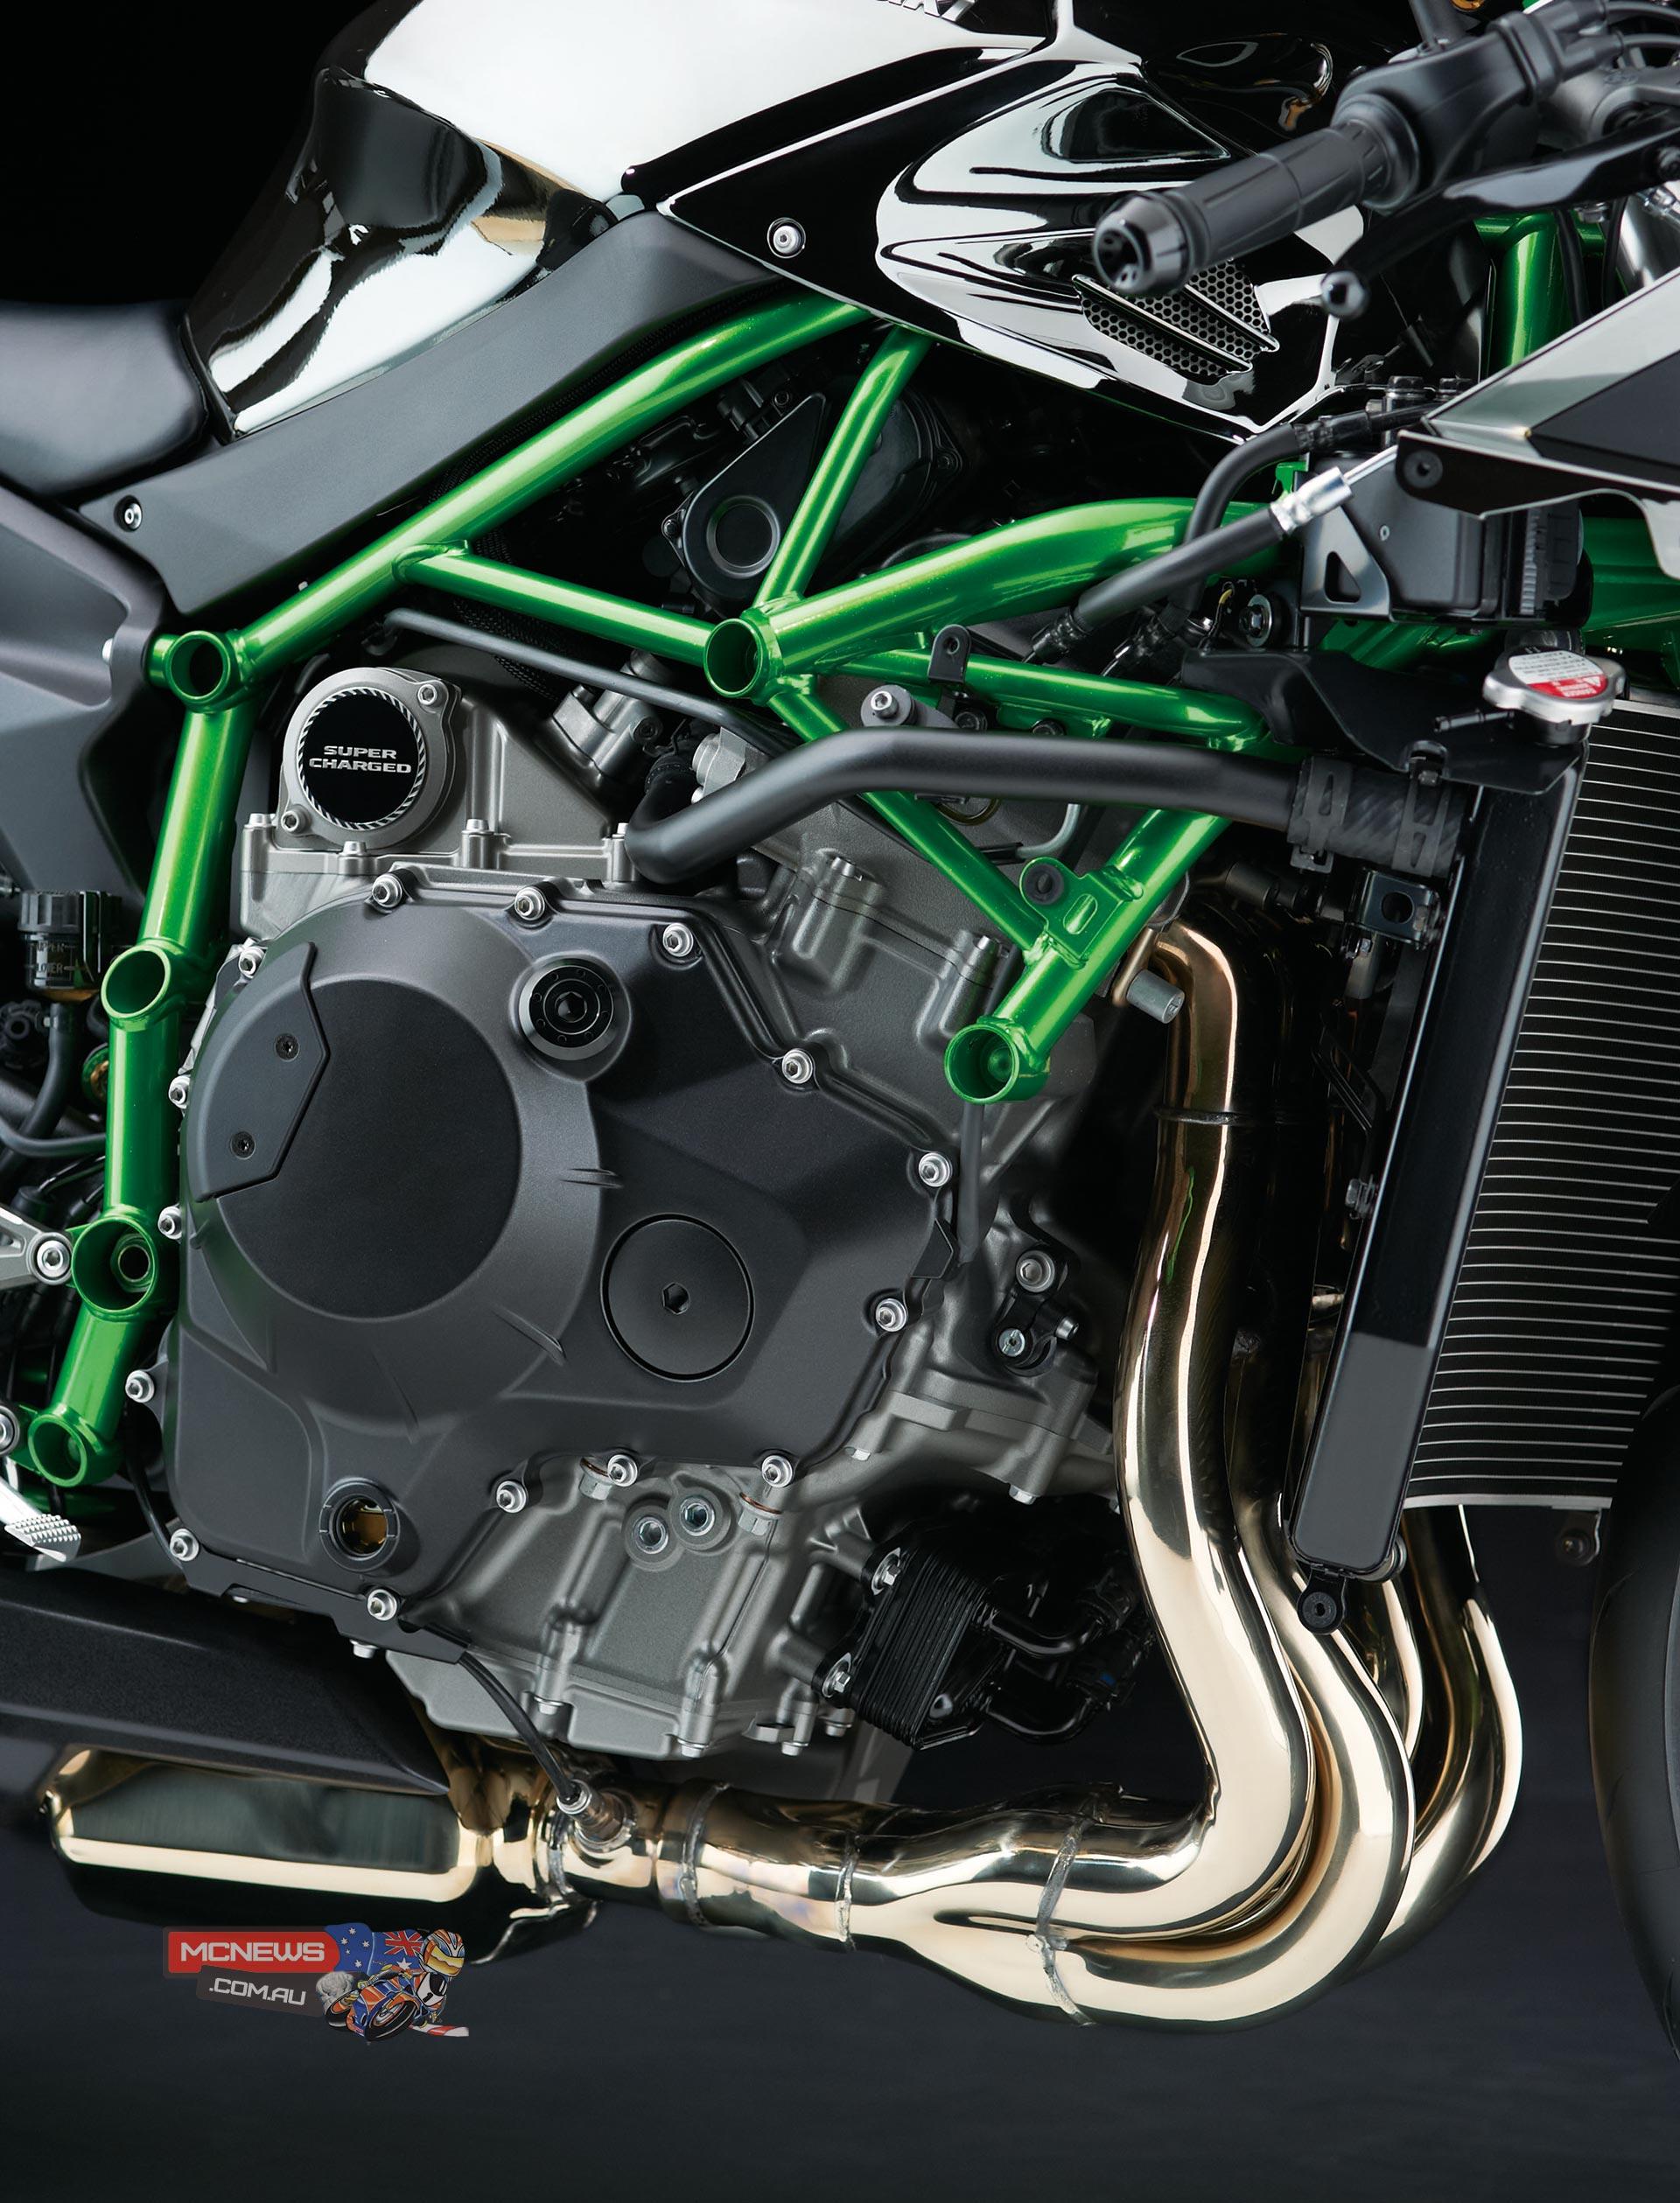 Kawasaki Ninja H2 In Full Detail Mcnewscomau